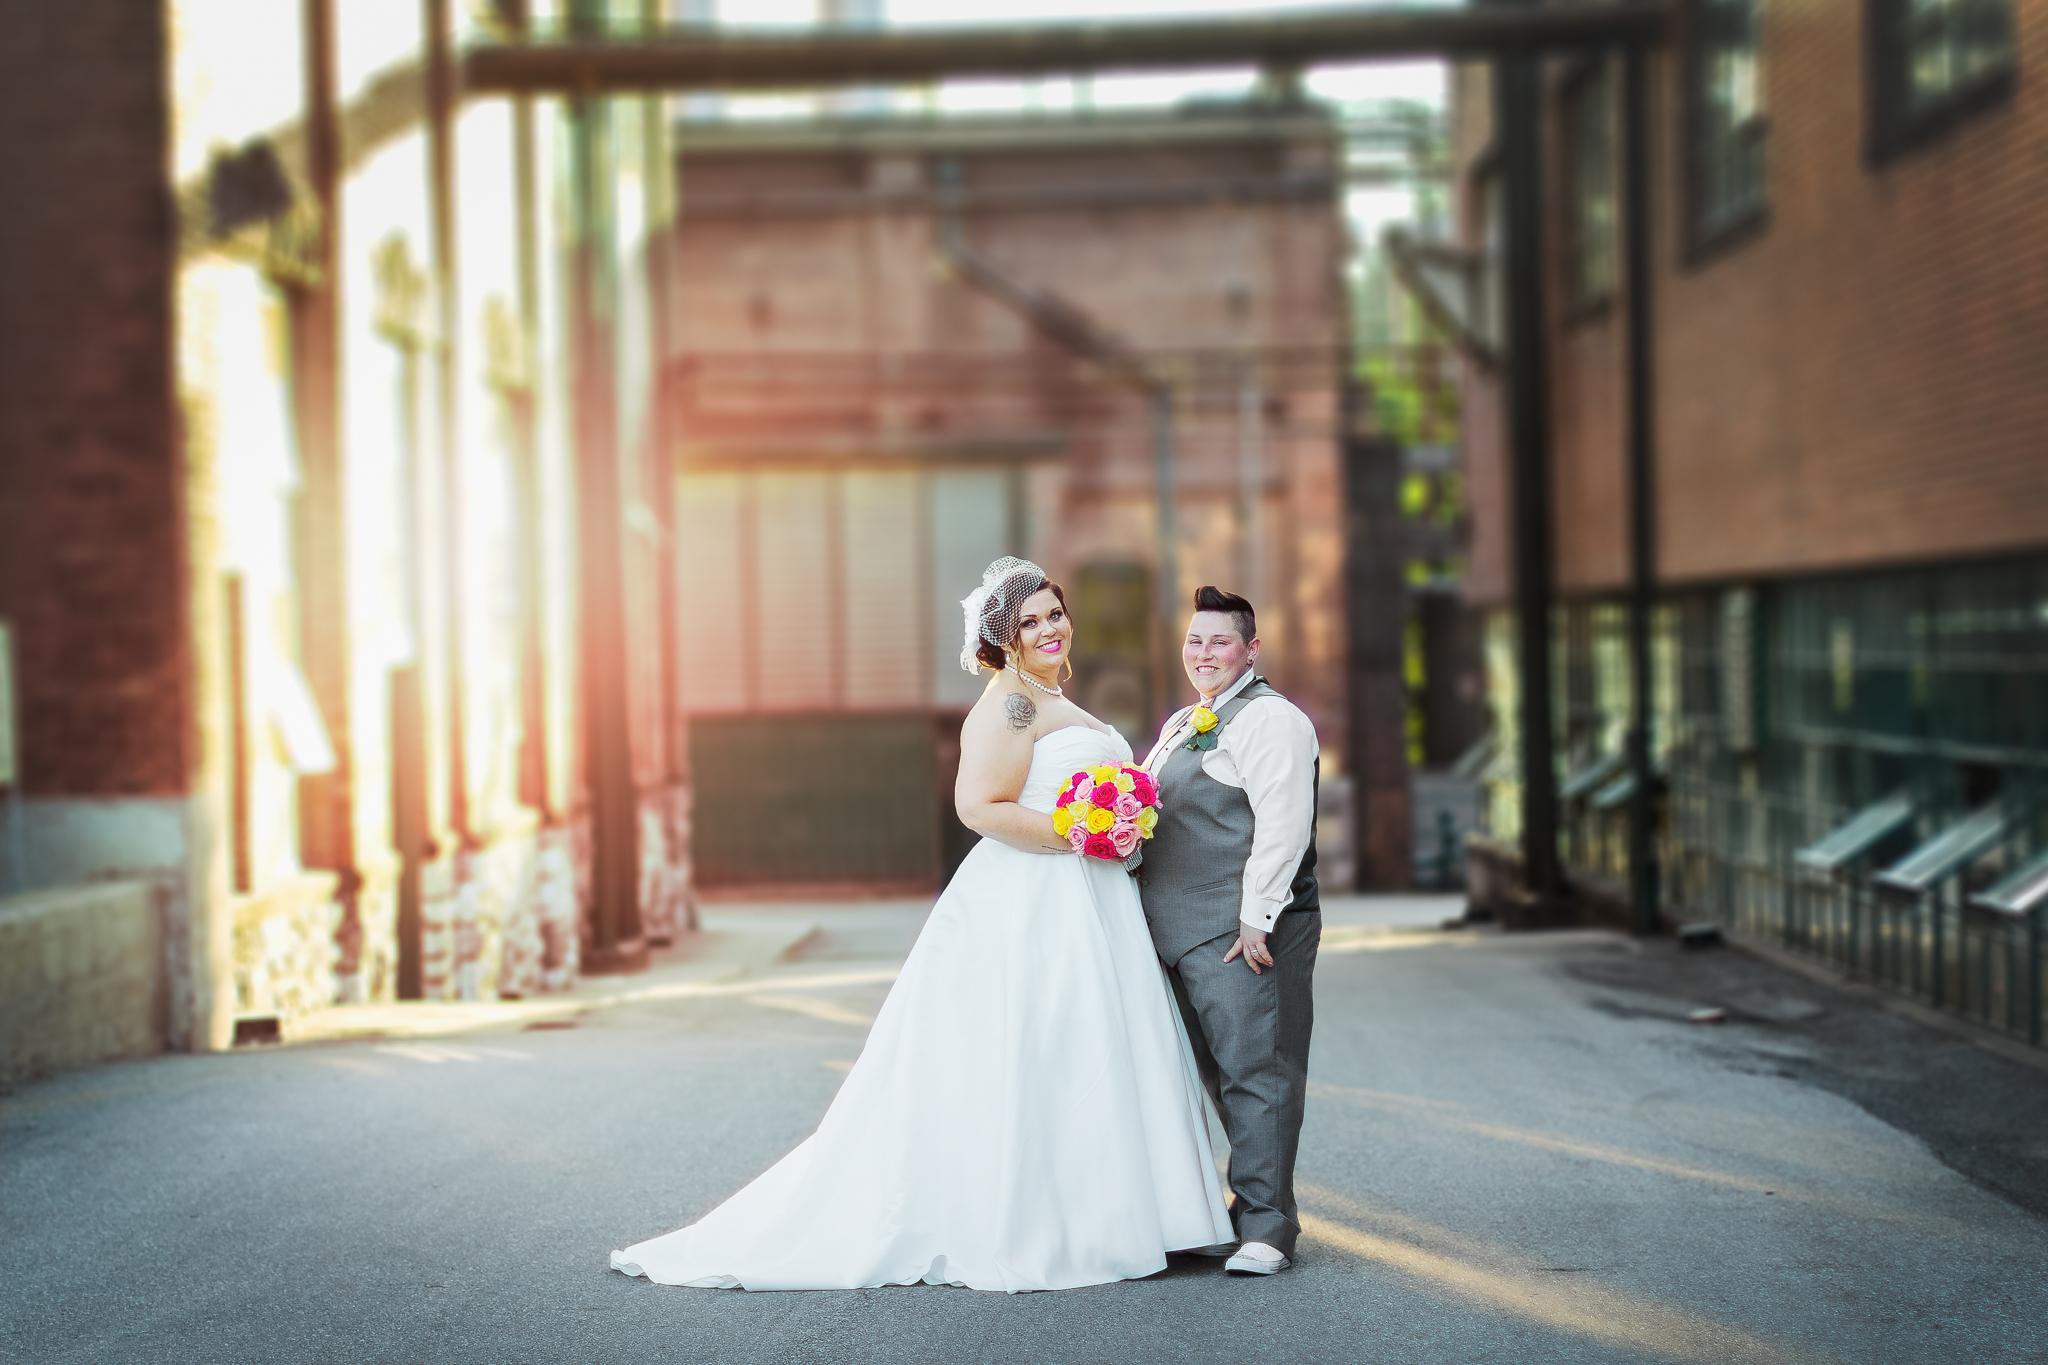 Richmond Kentucky Wedding Photographer - Ariana Jordan Photography -24-2.jpg